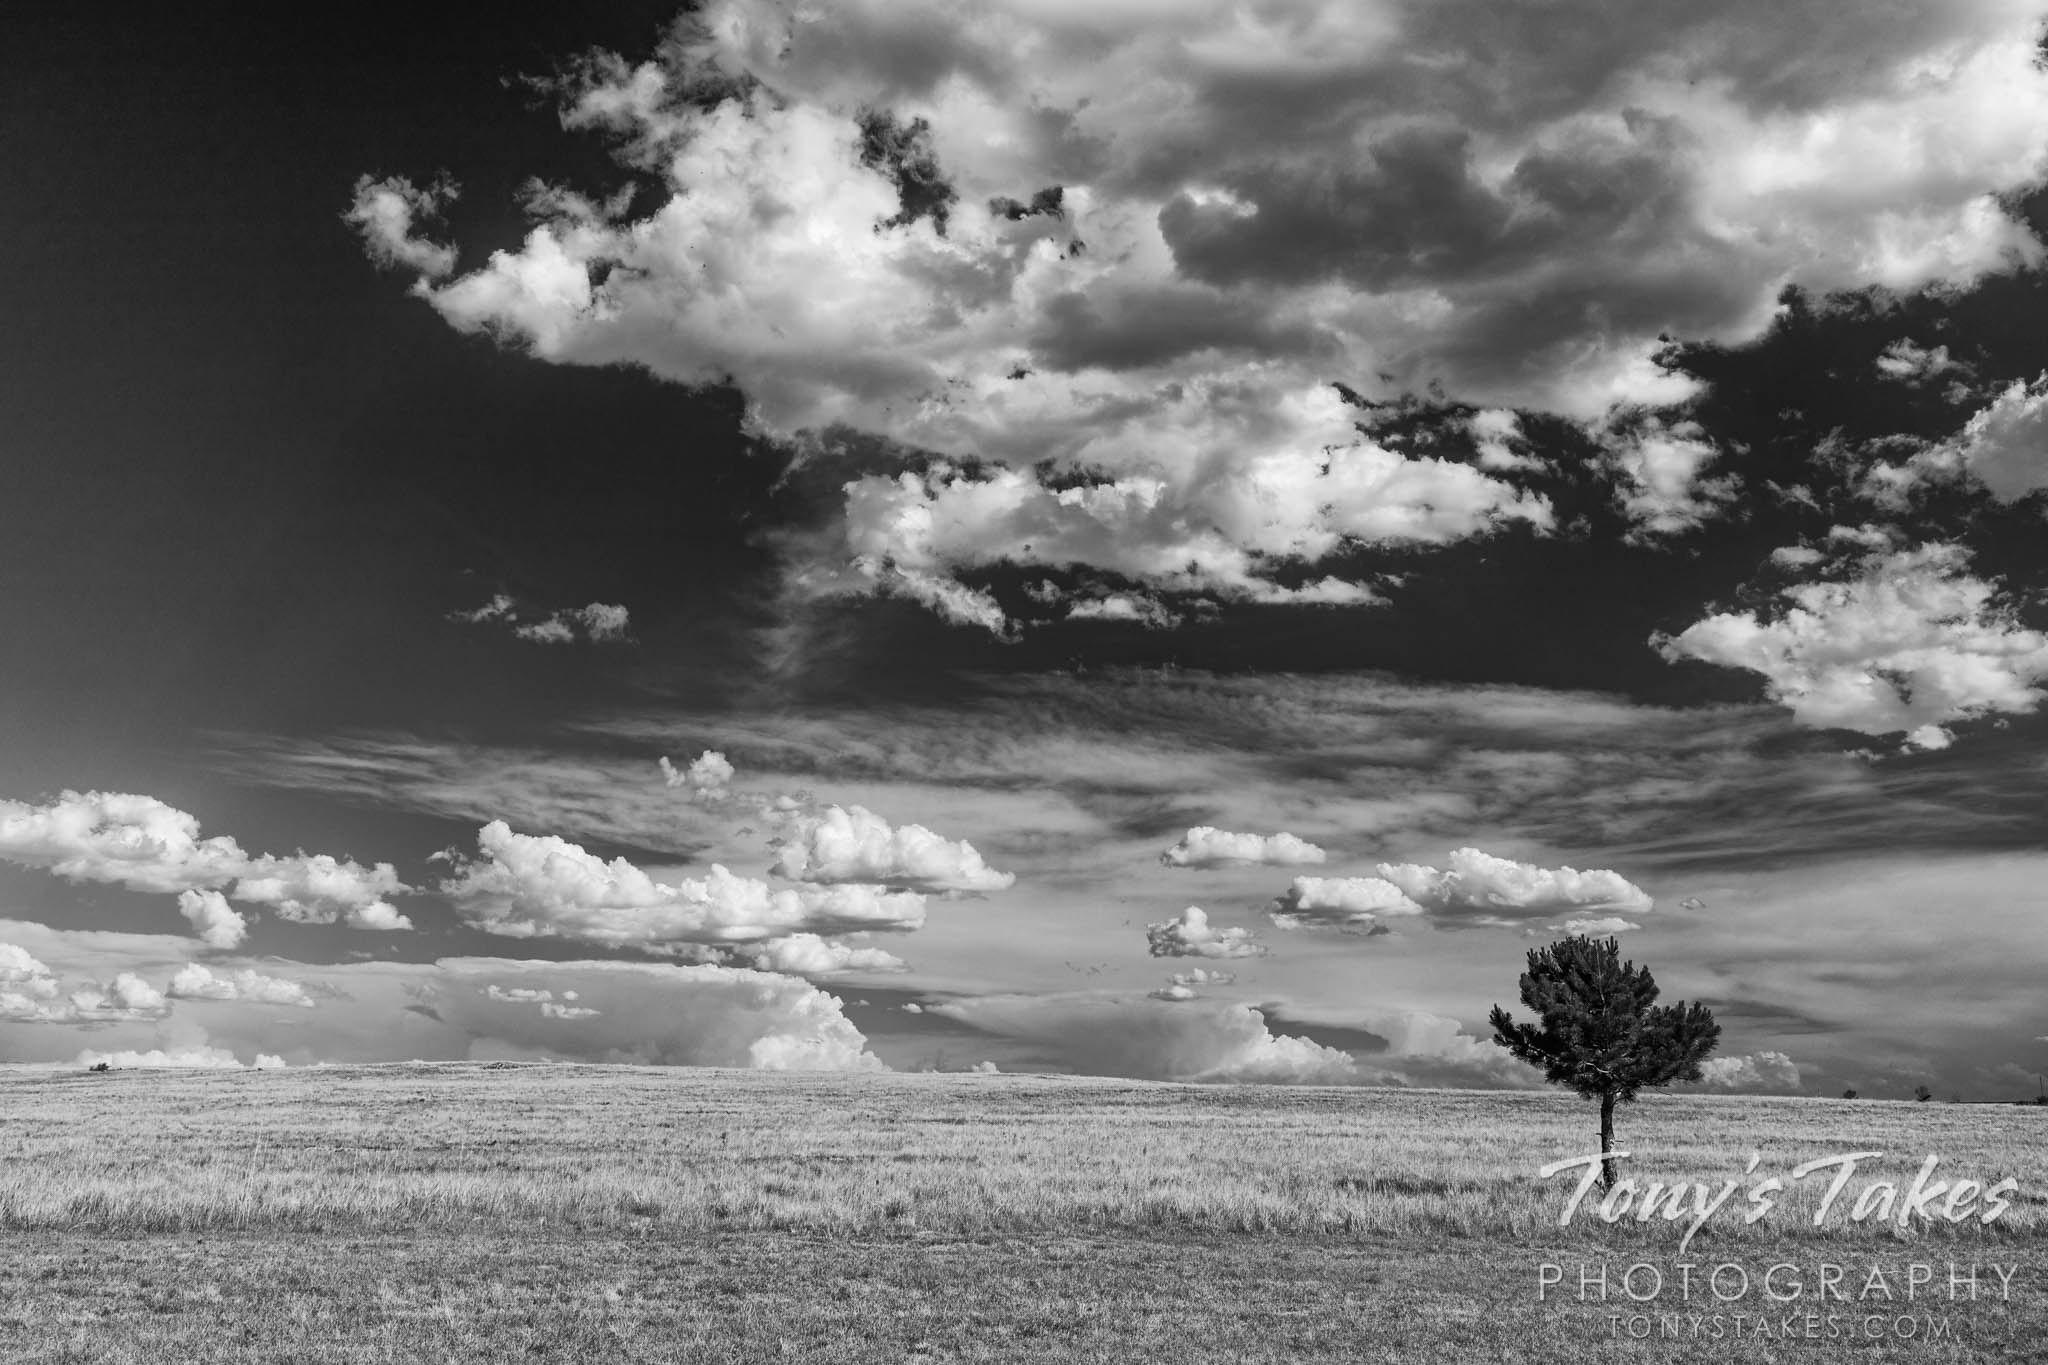 Lone tree on the Colorado plains